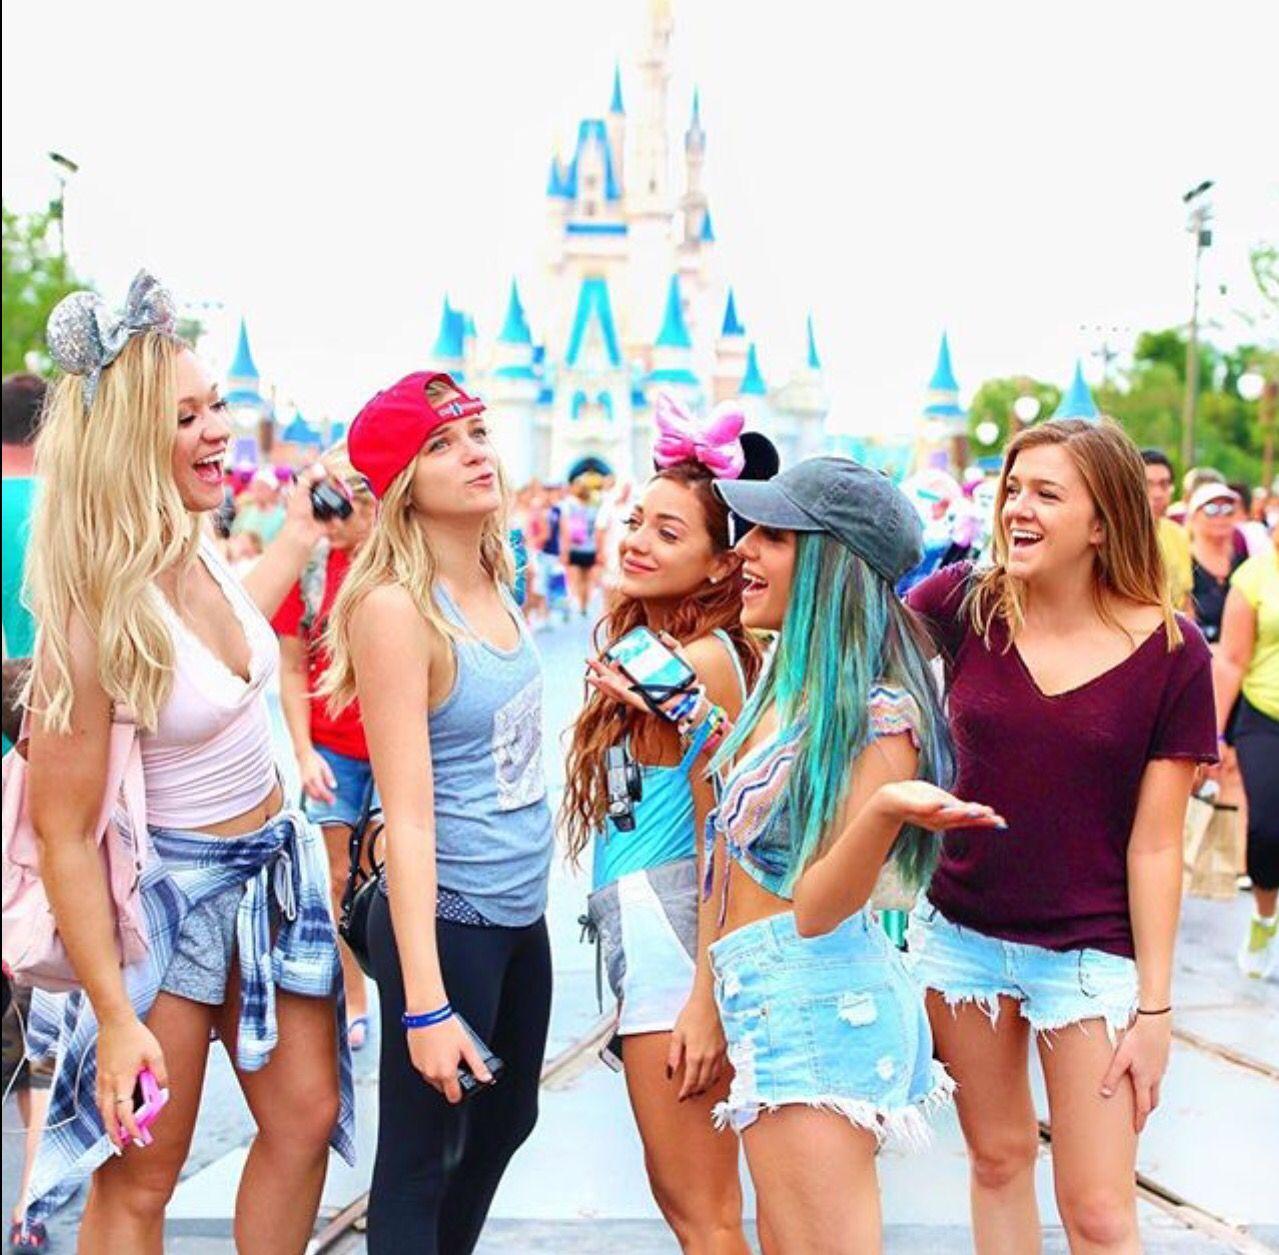 Disney Worlddddd !!!!!!